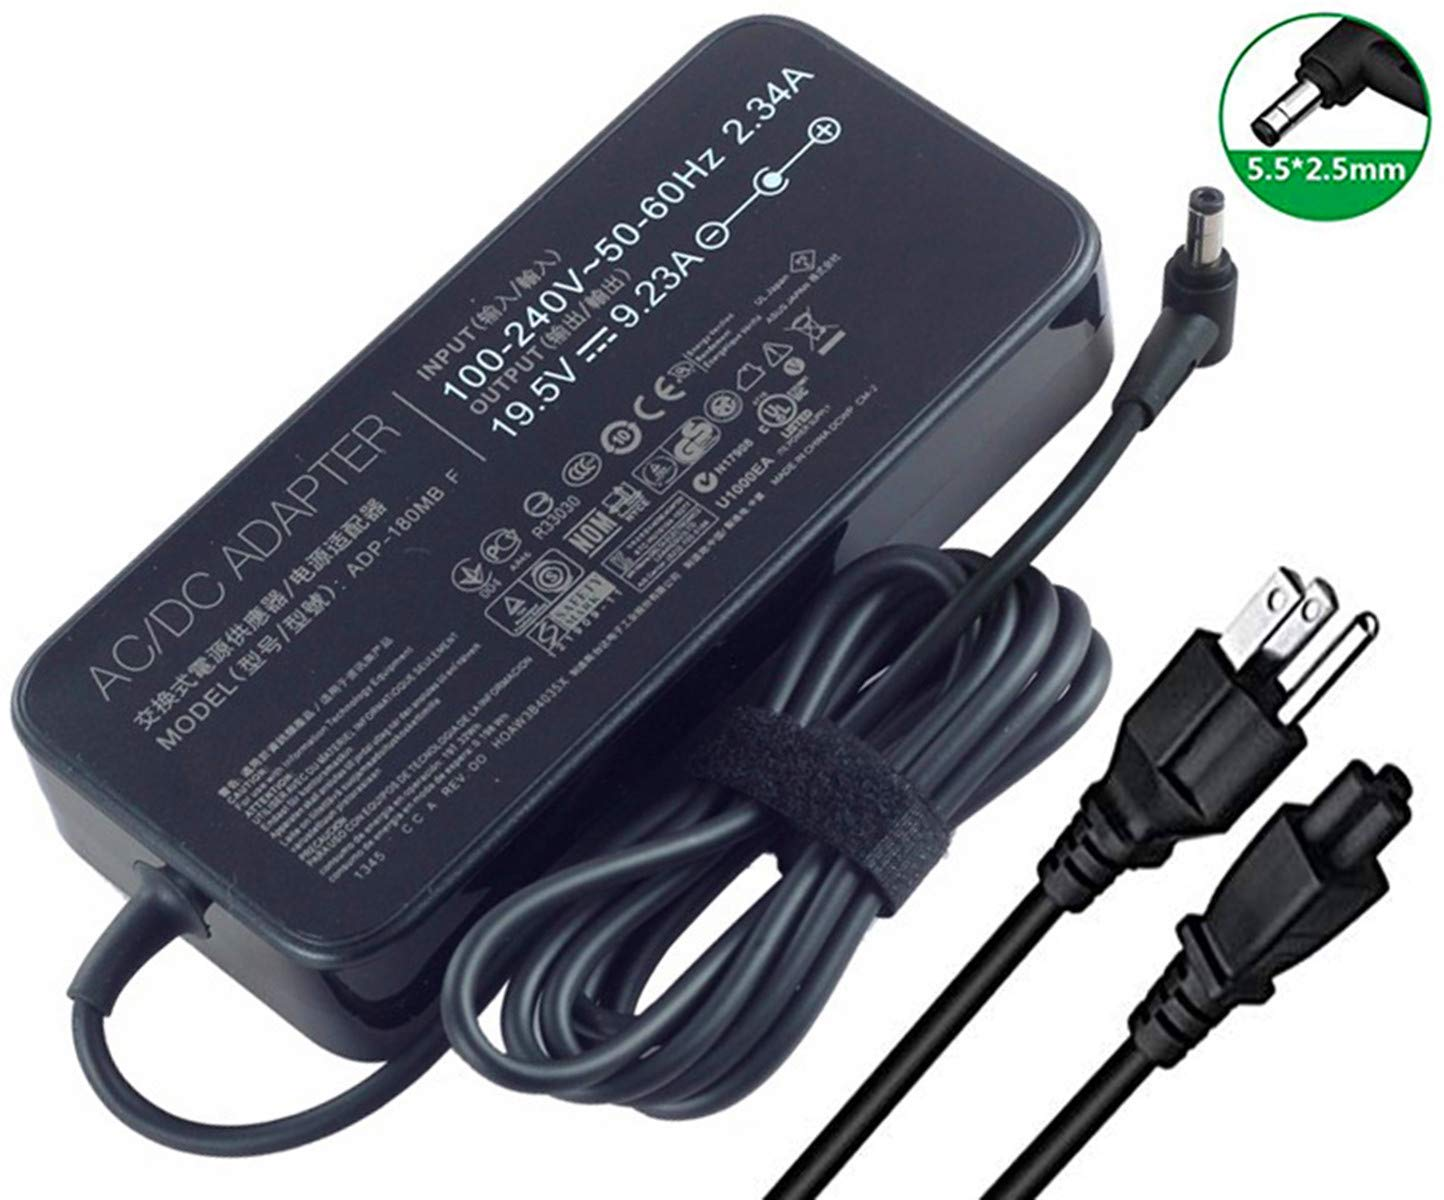 New 19.5V 9.23A 180W Laptop Charger ADP-180MB F FA180PM111 AC Power Adapter for Asus ROG G75 G75VW G75VX GL502VT G750JW G750JM G750JX G751JL G751JM G752VL G-Series Gaming Laptops